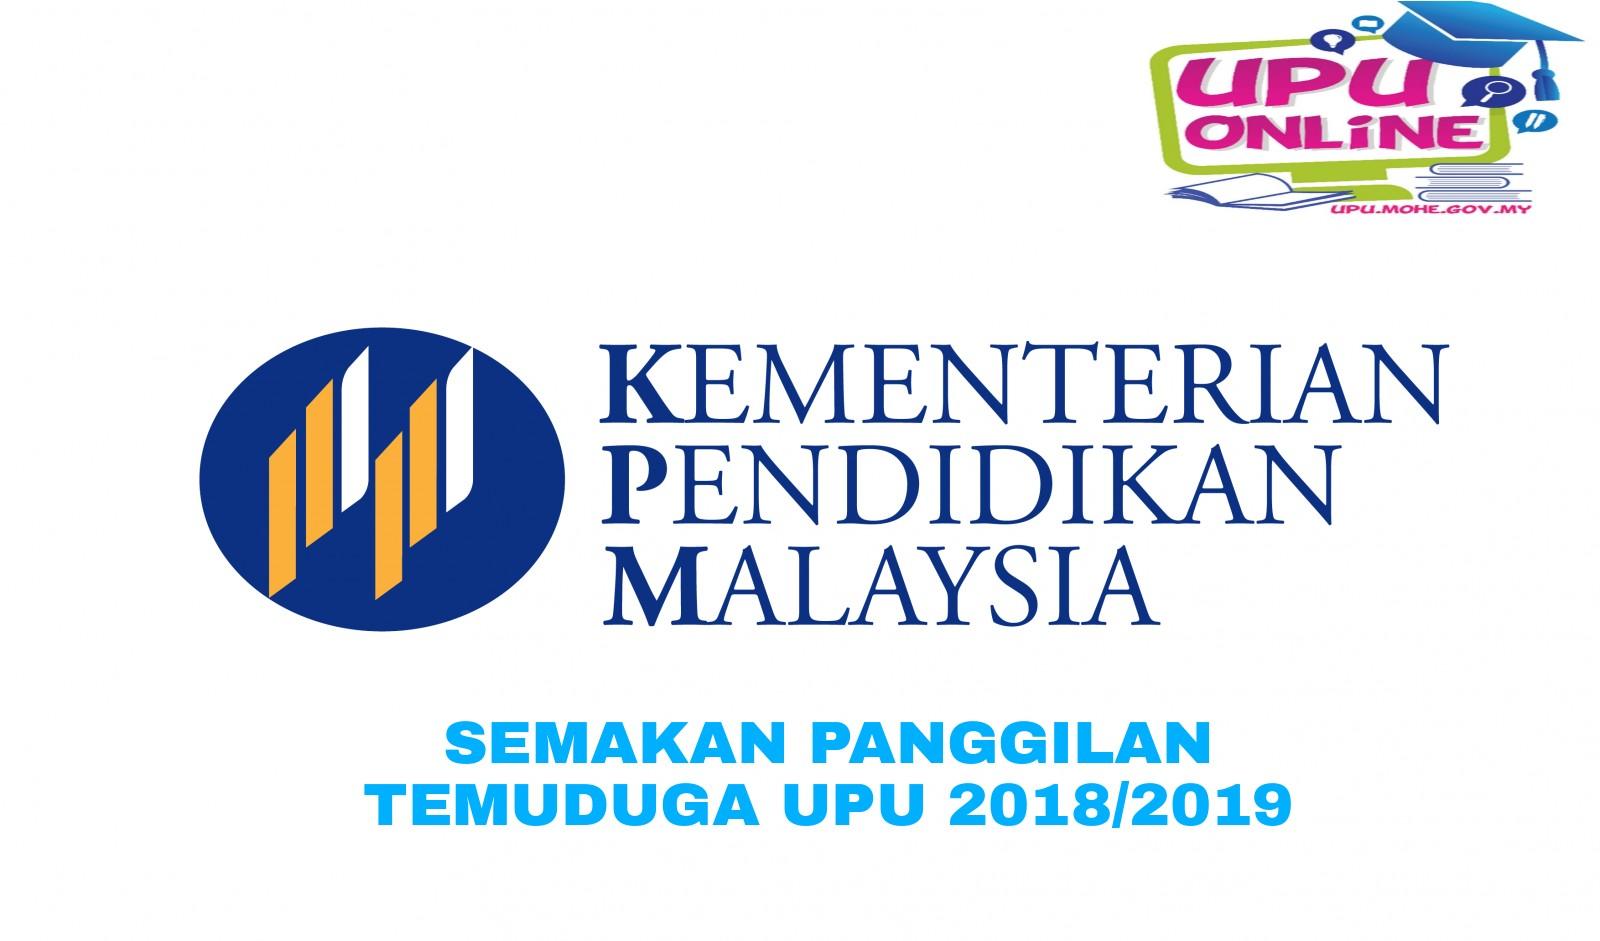 Semakan Panggilan Temuduga Upu 2018 Lepasan Stpm Setaraf Pendidikan Malaysia